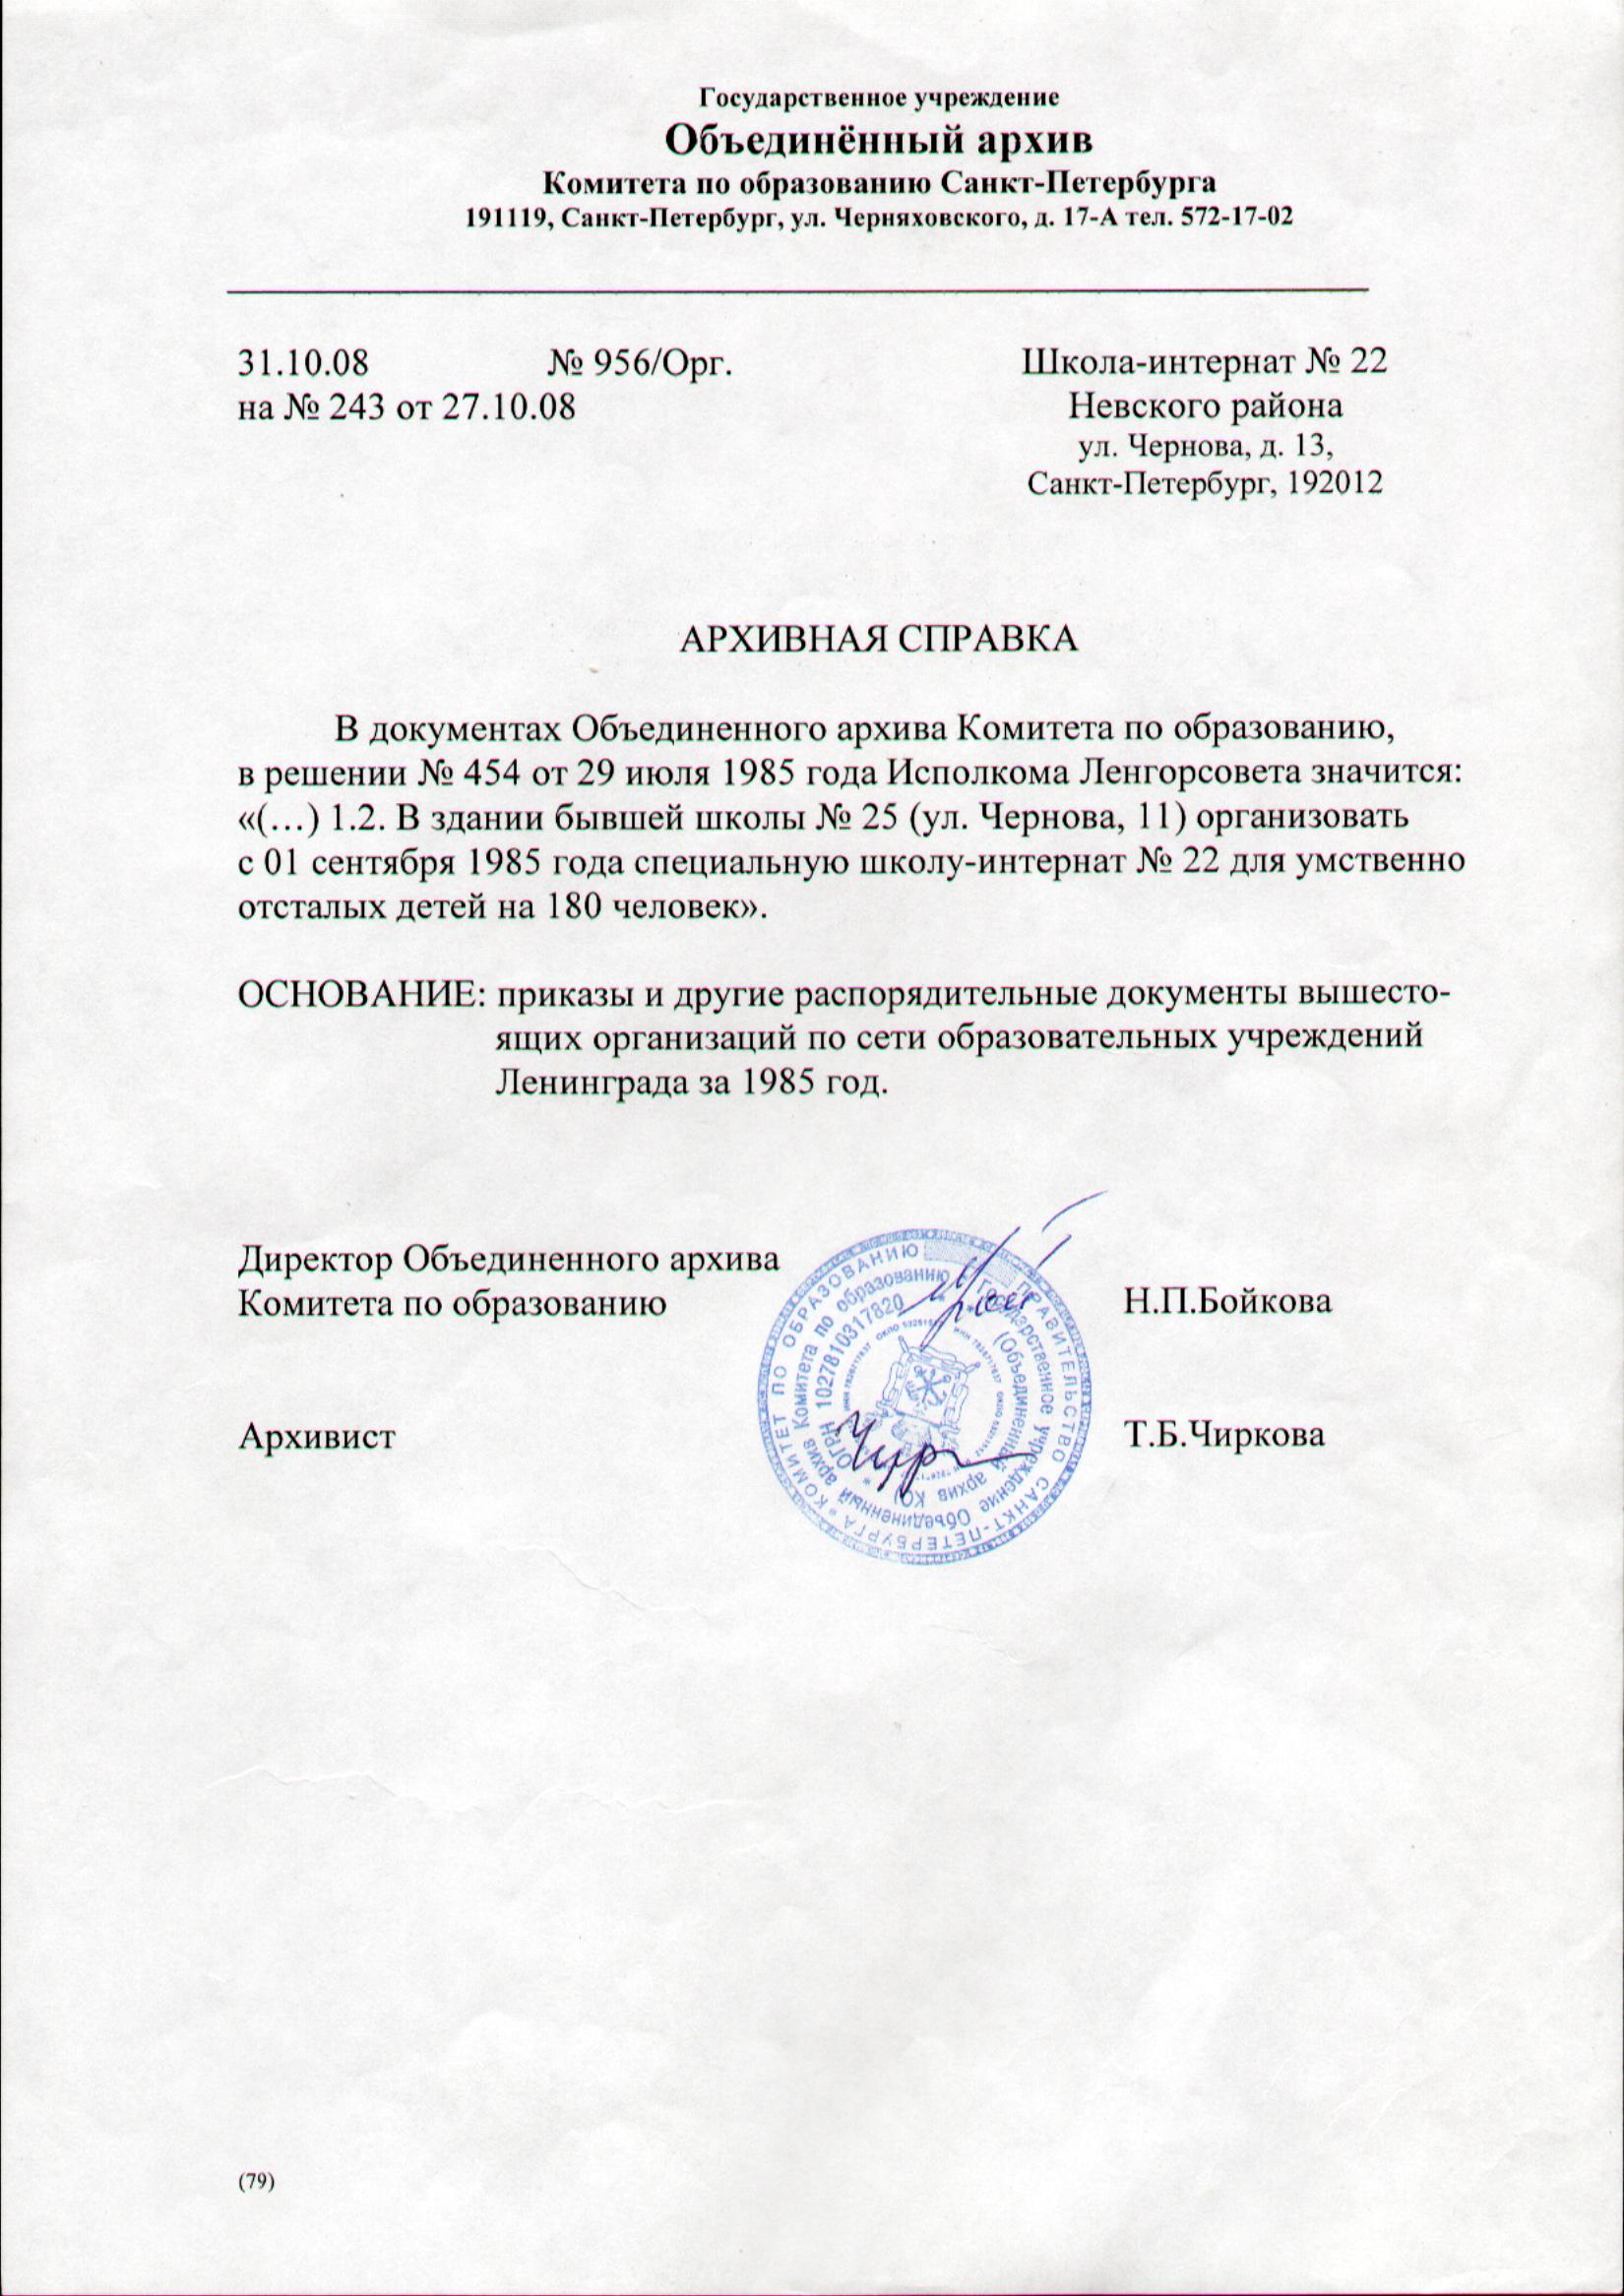 Справка 001-ГС у Библиотека им. Ленина